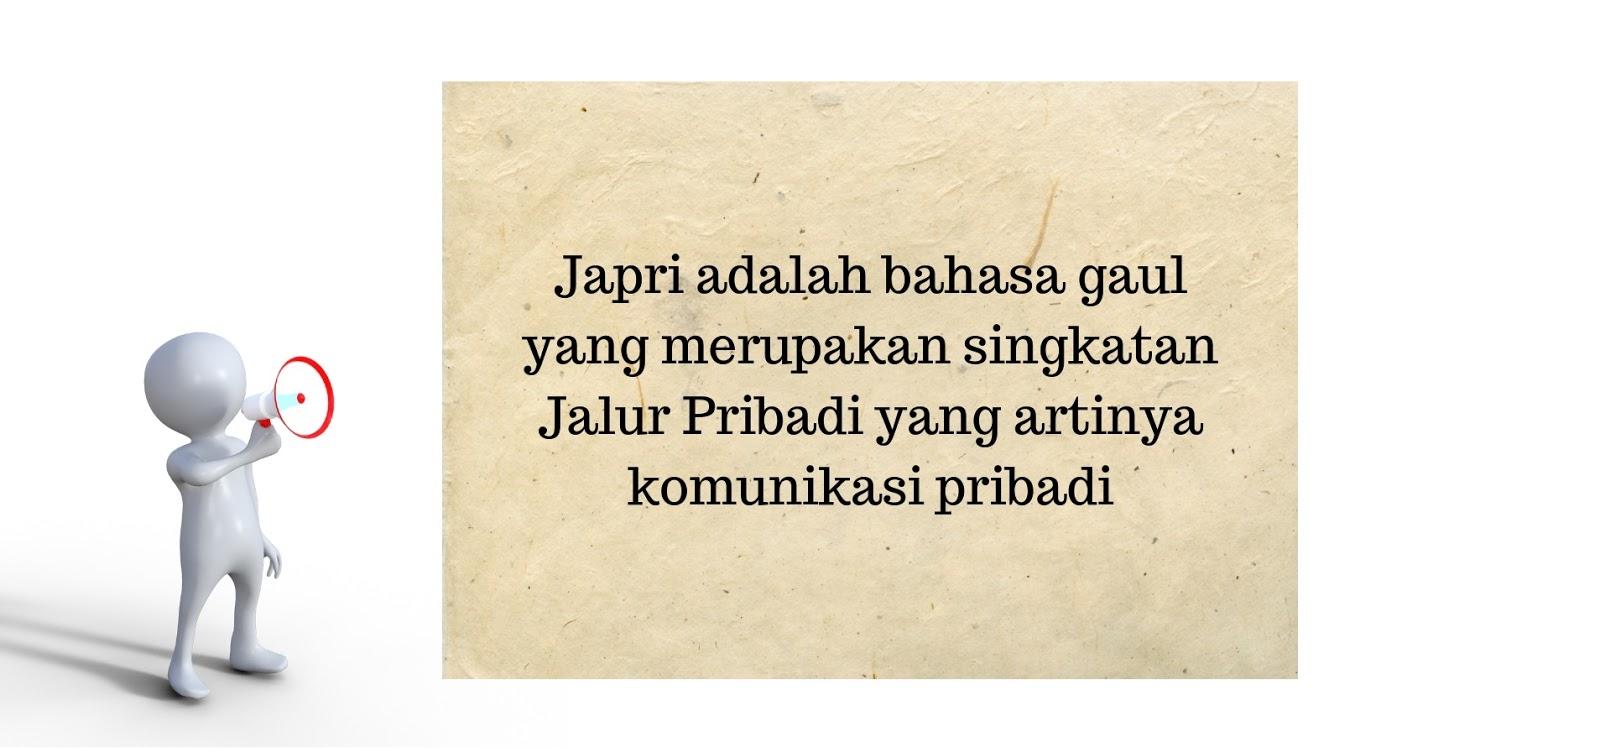 Japri adalah bahasa gaul